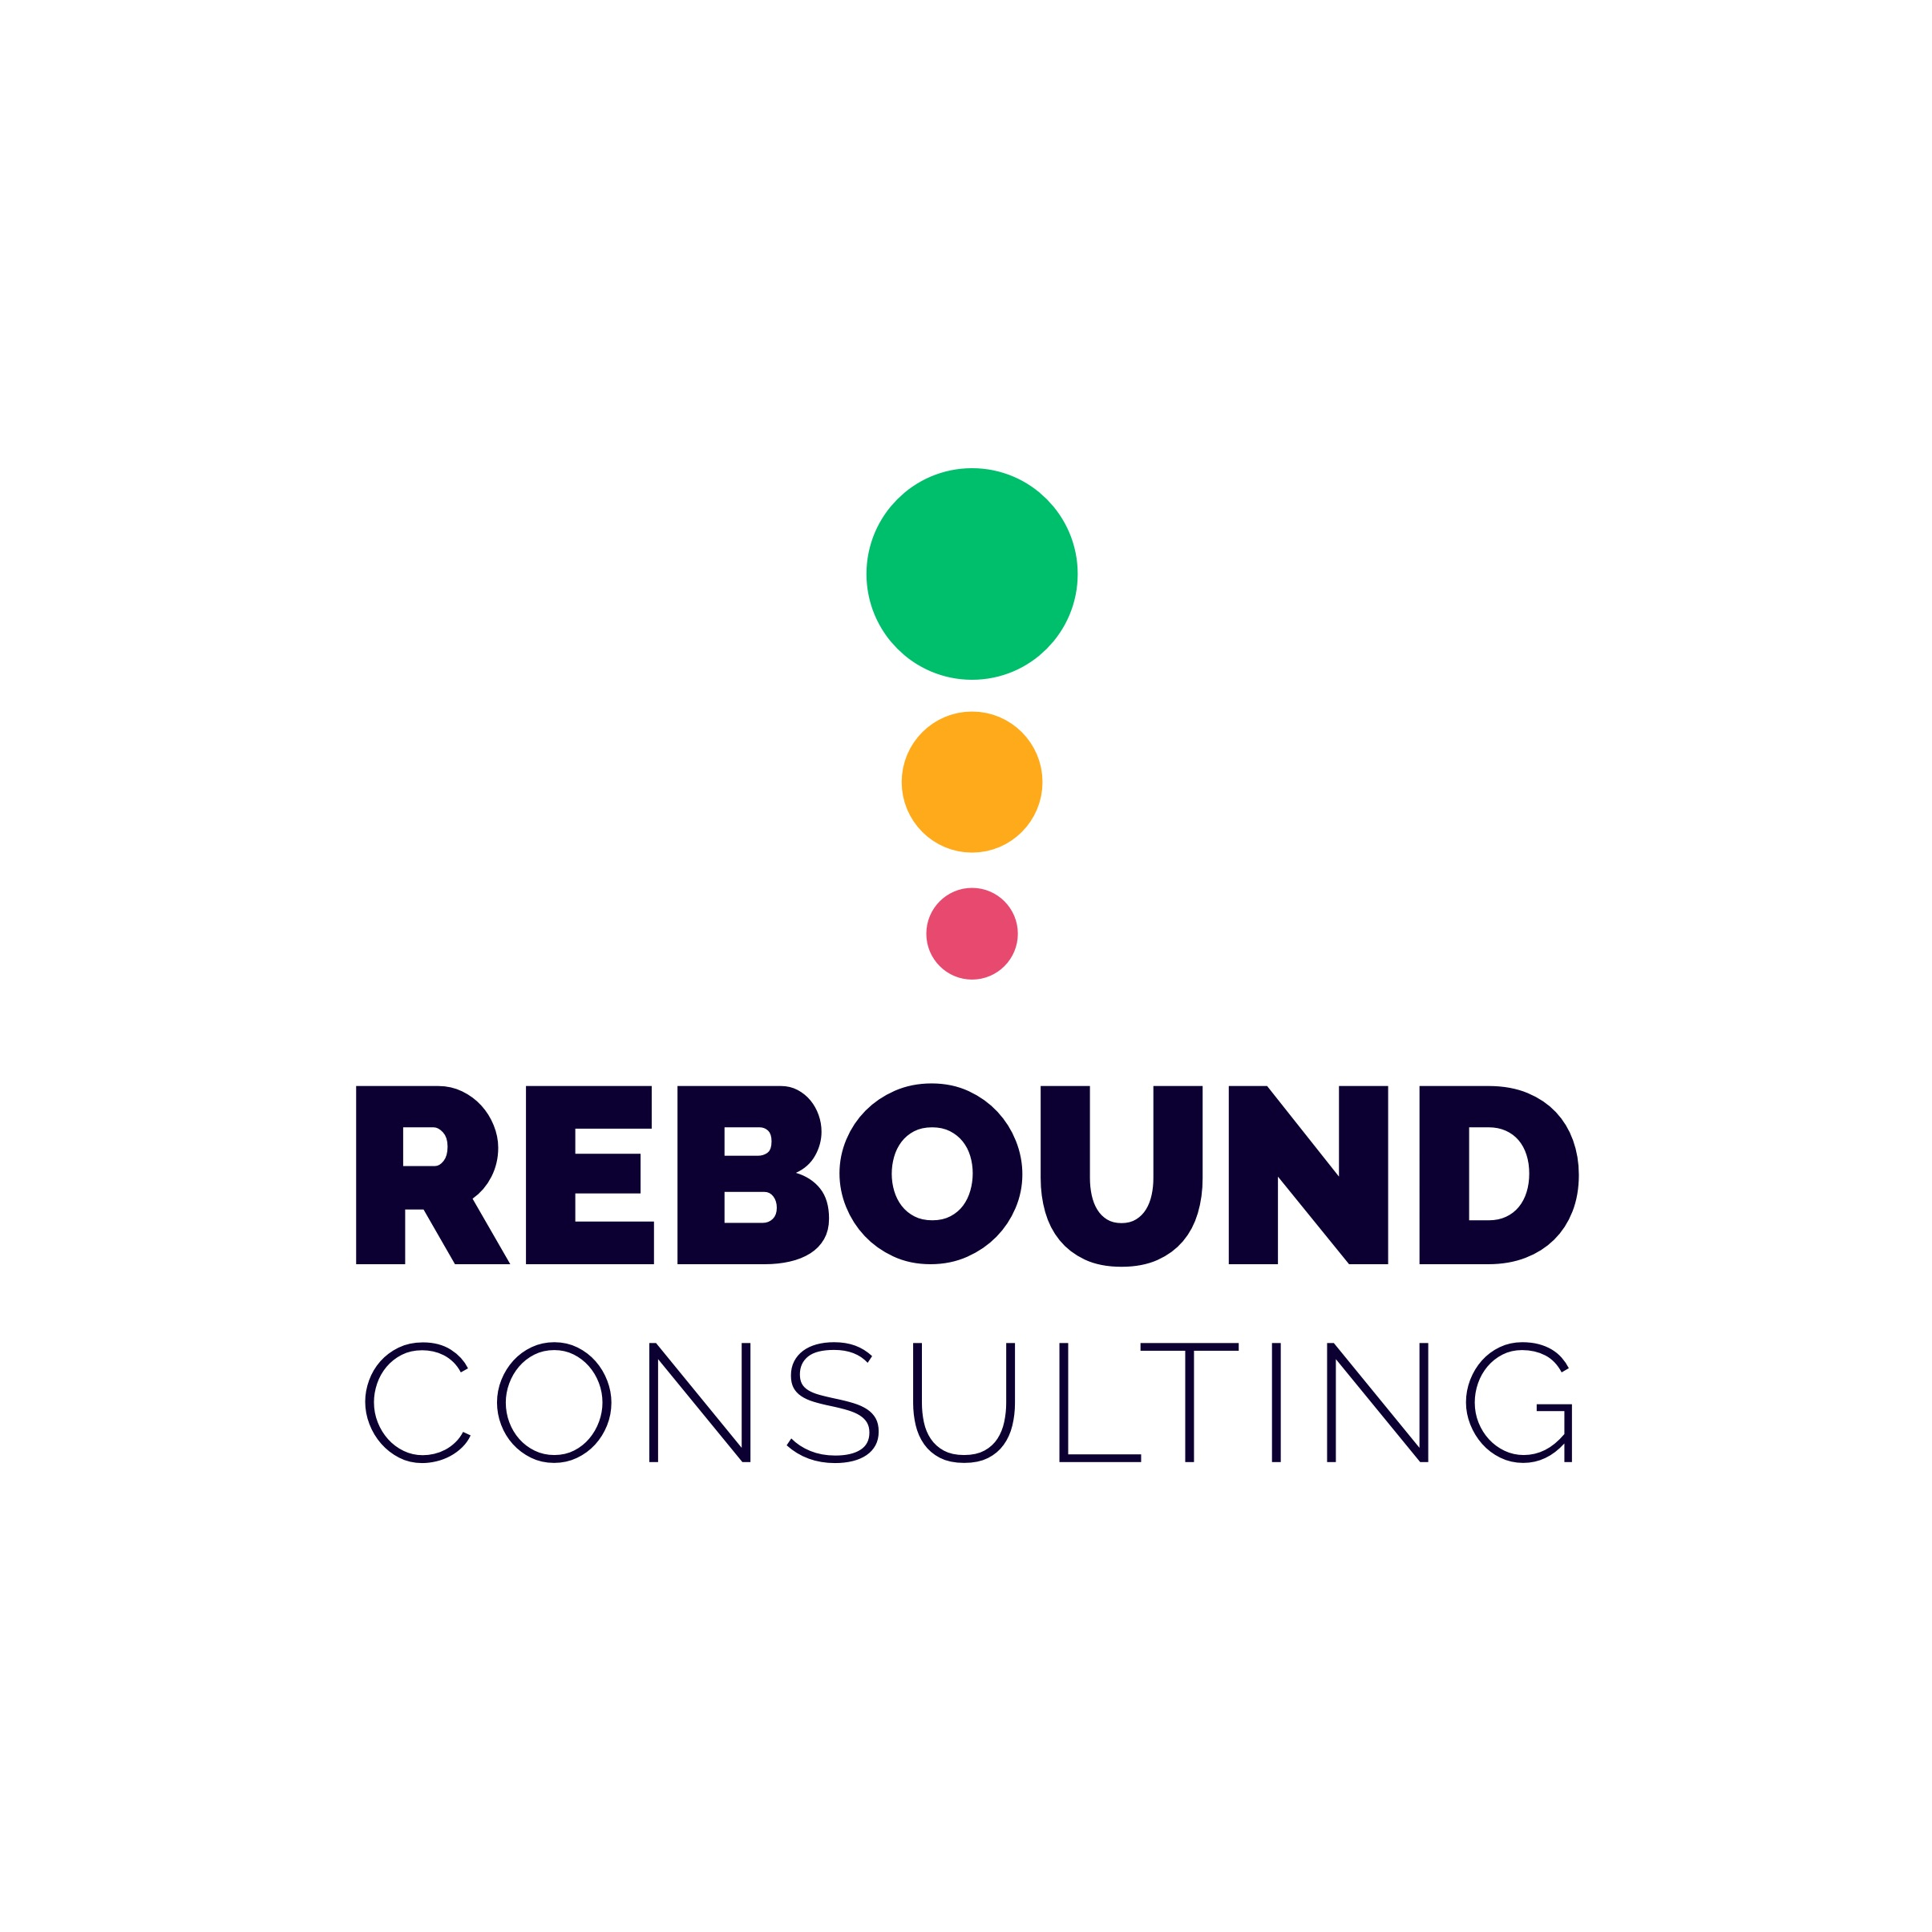 Rebound Consulting Logo by Casper Creative